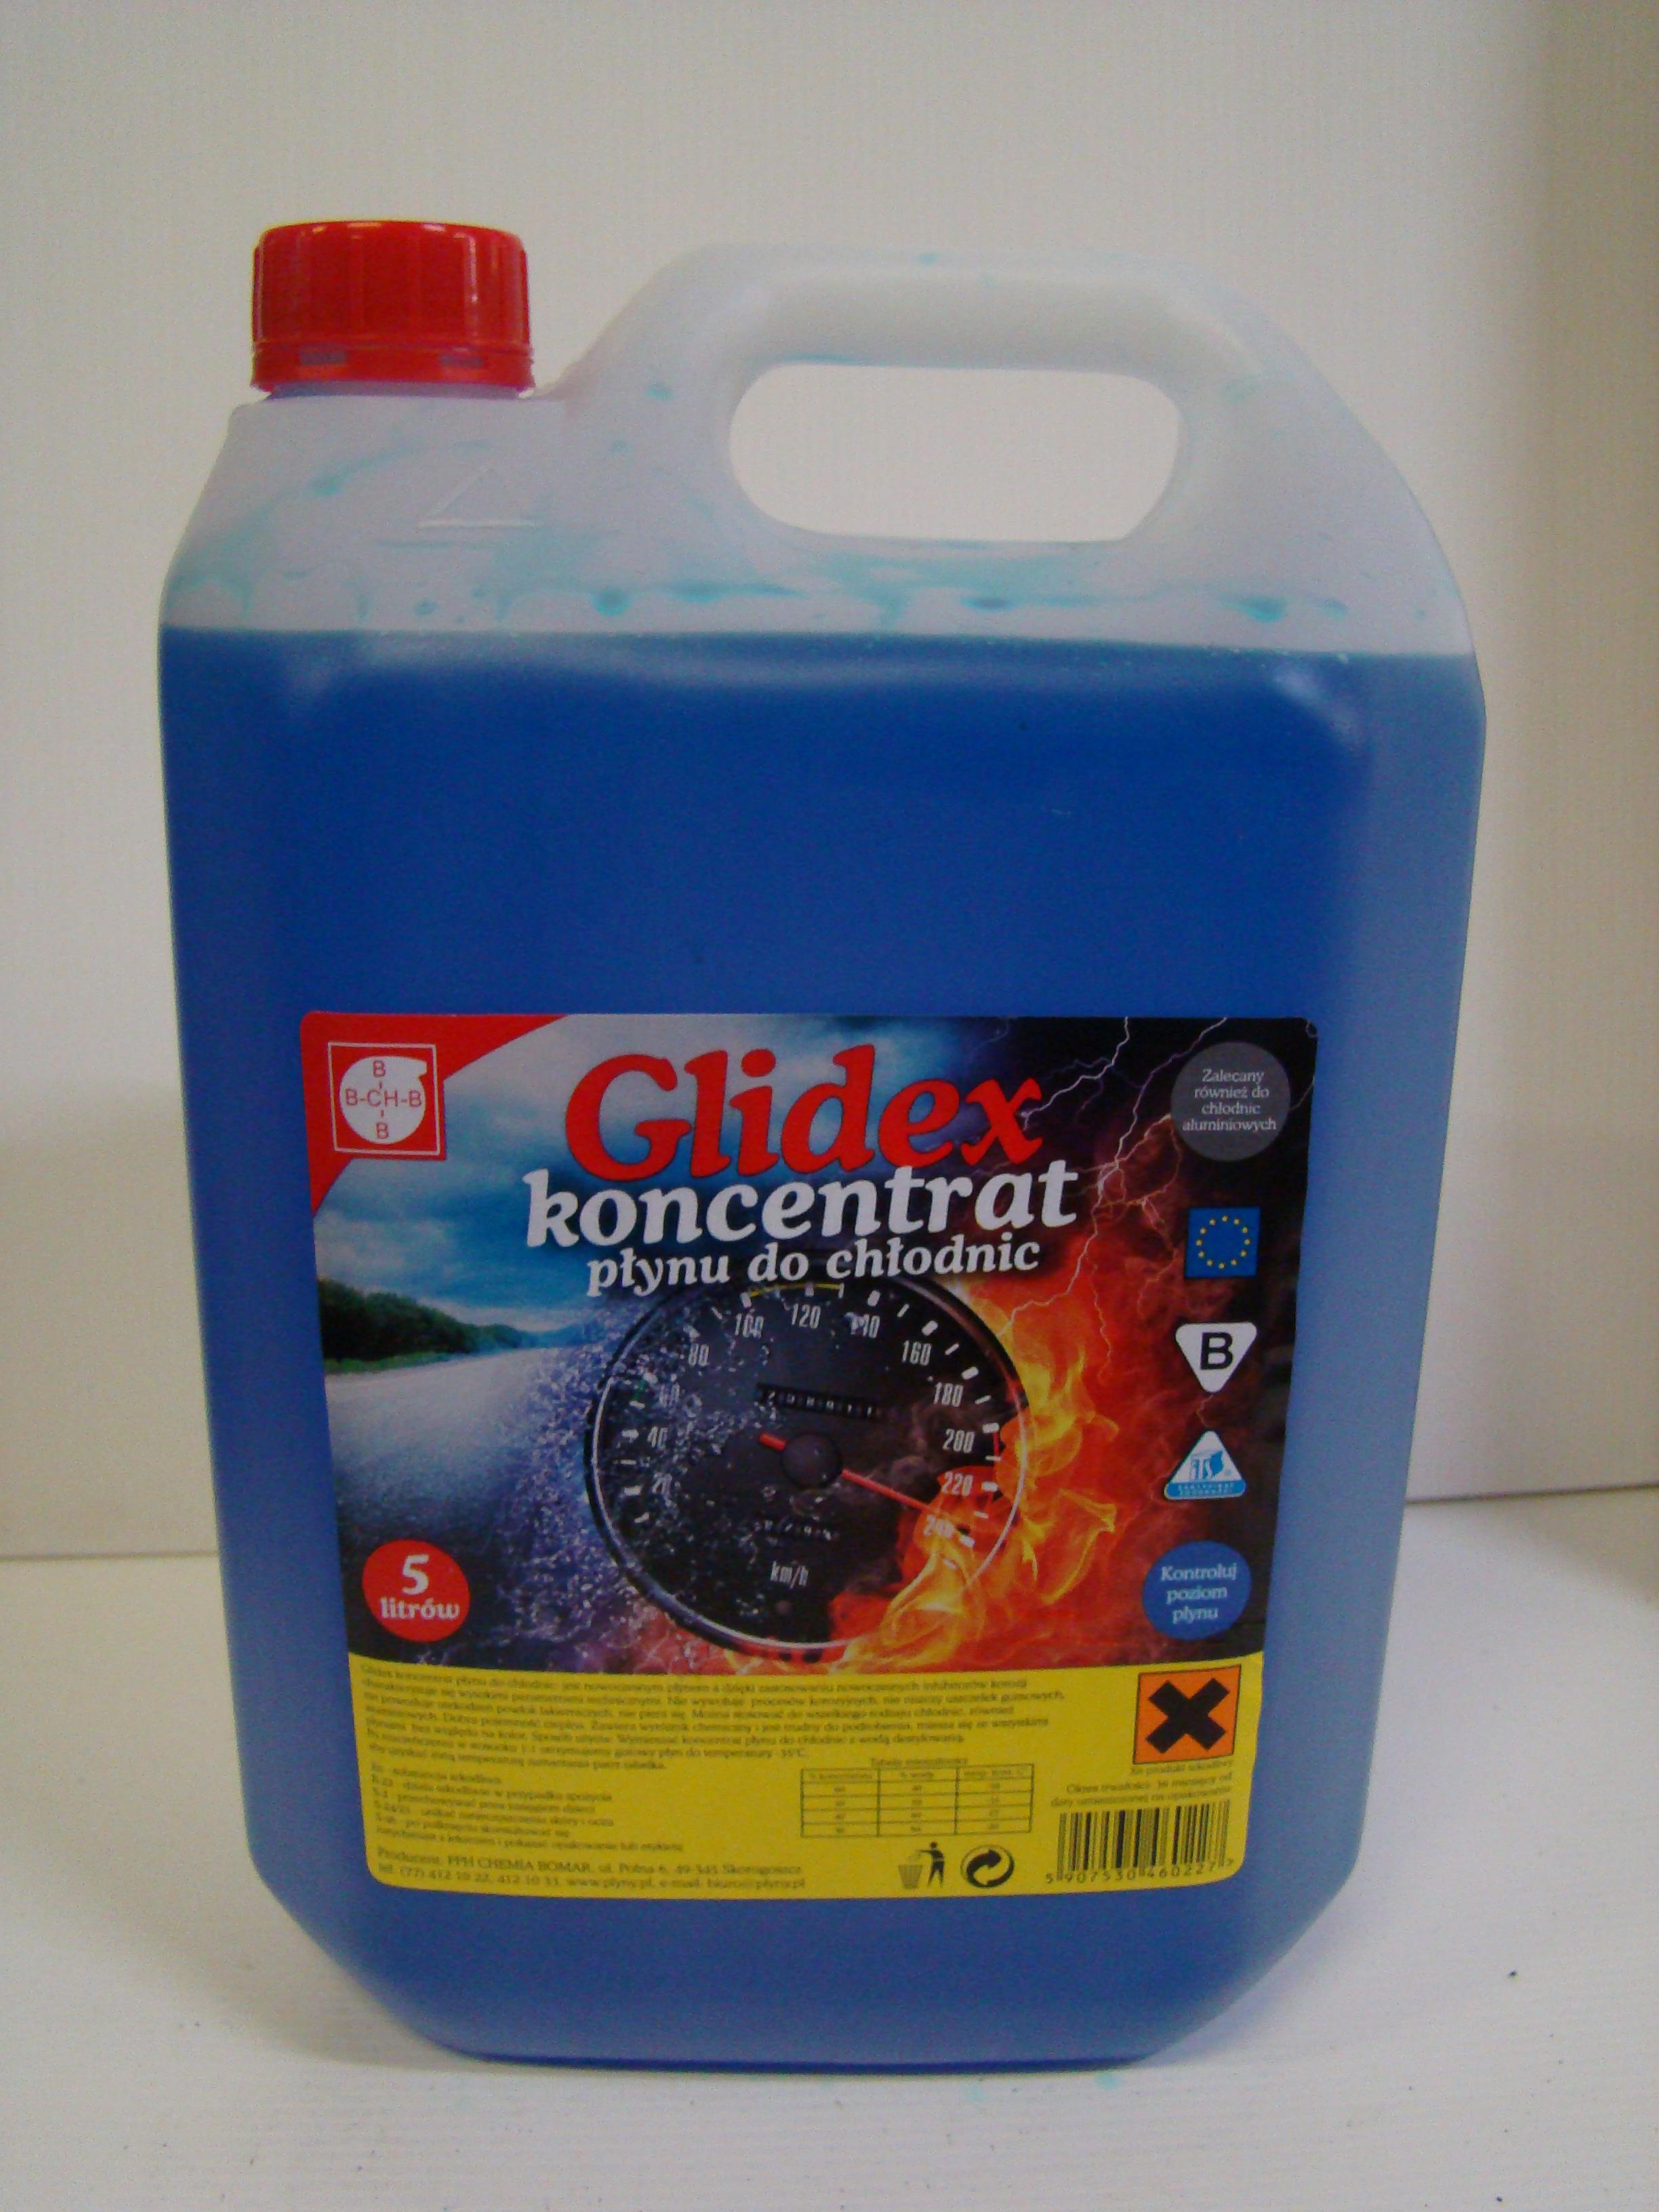 Płyn do chłodnic Glidex koncentrat